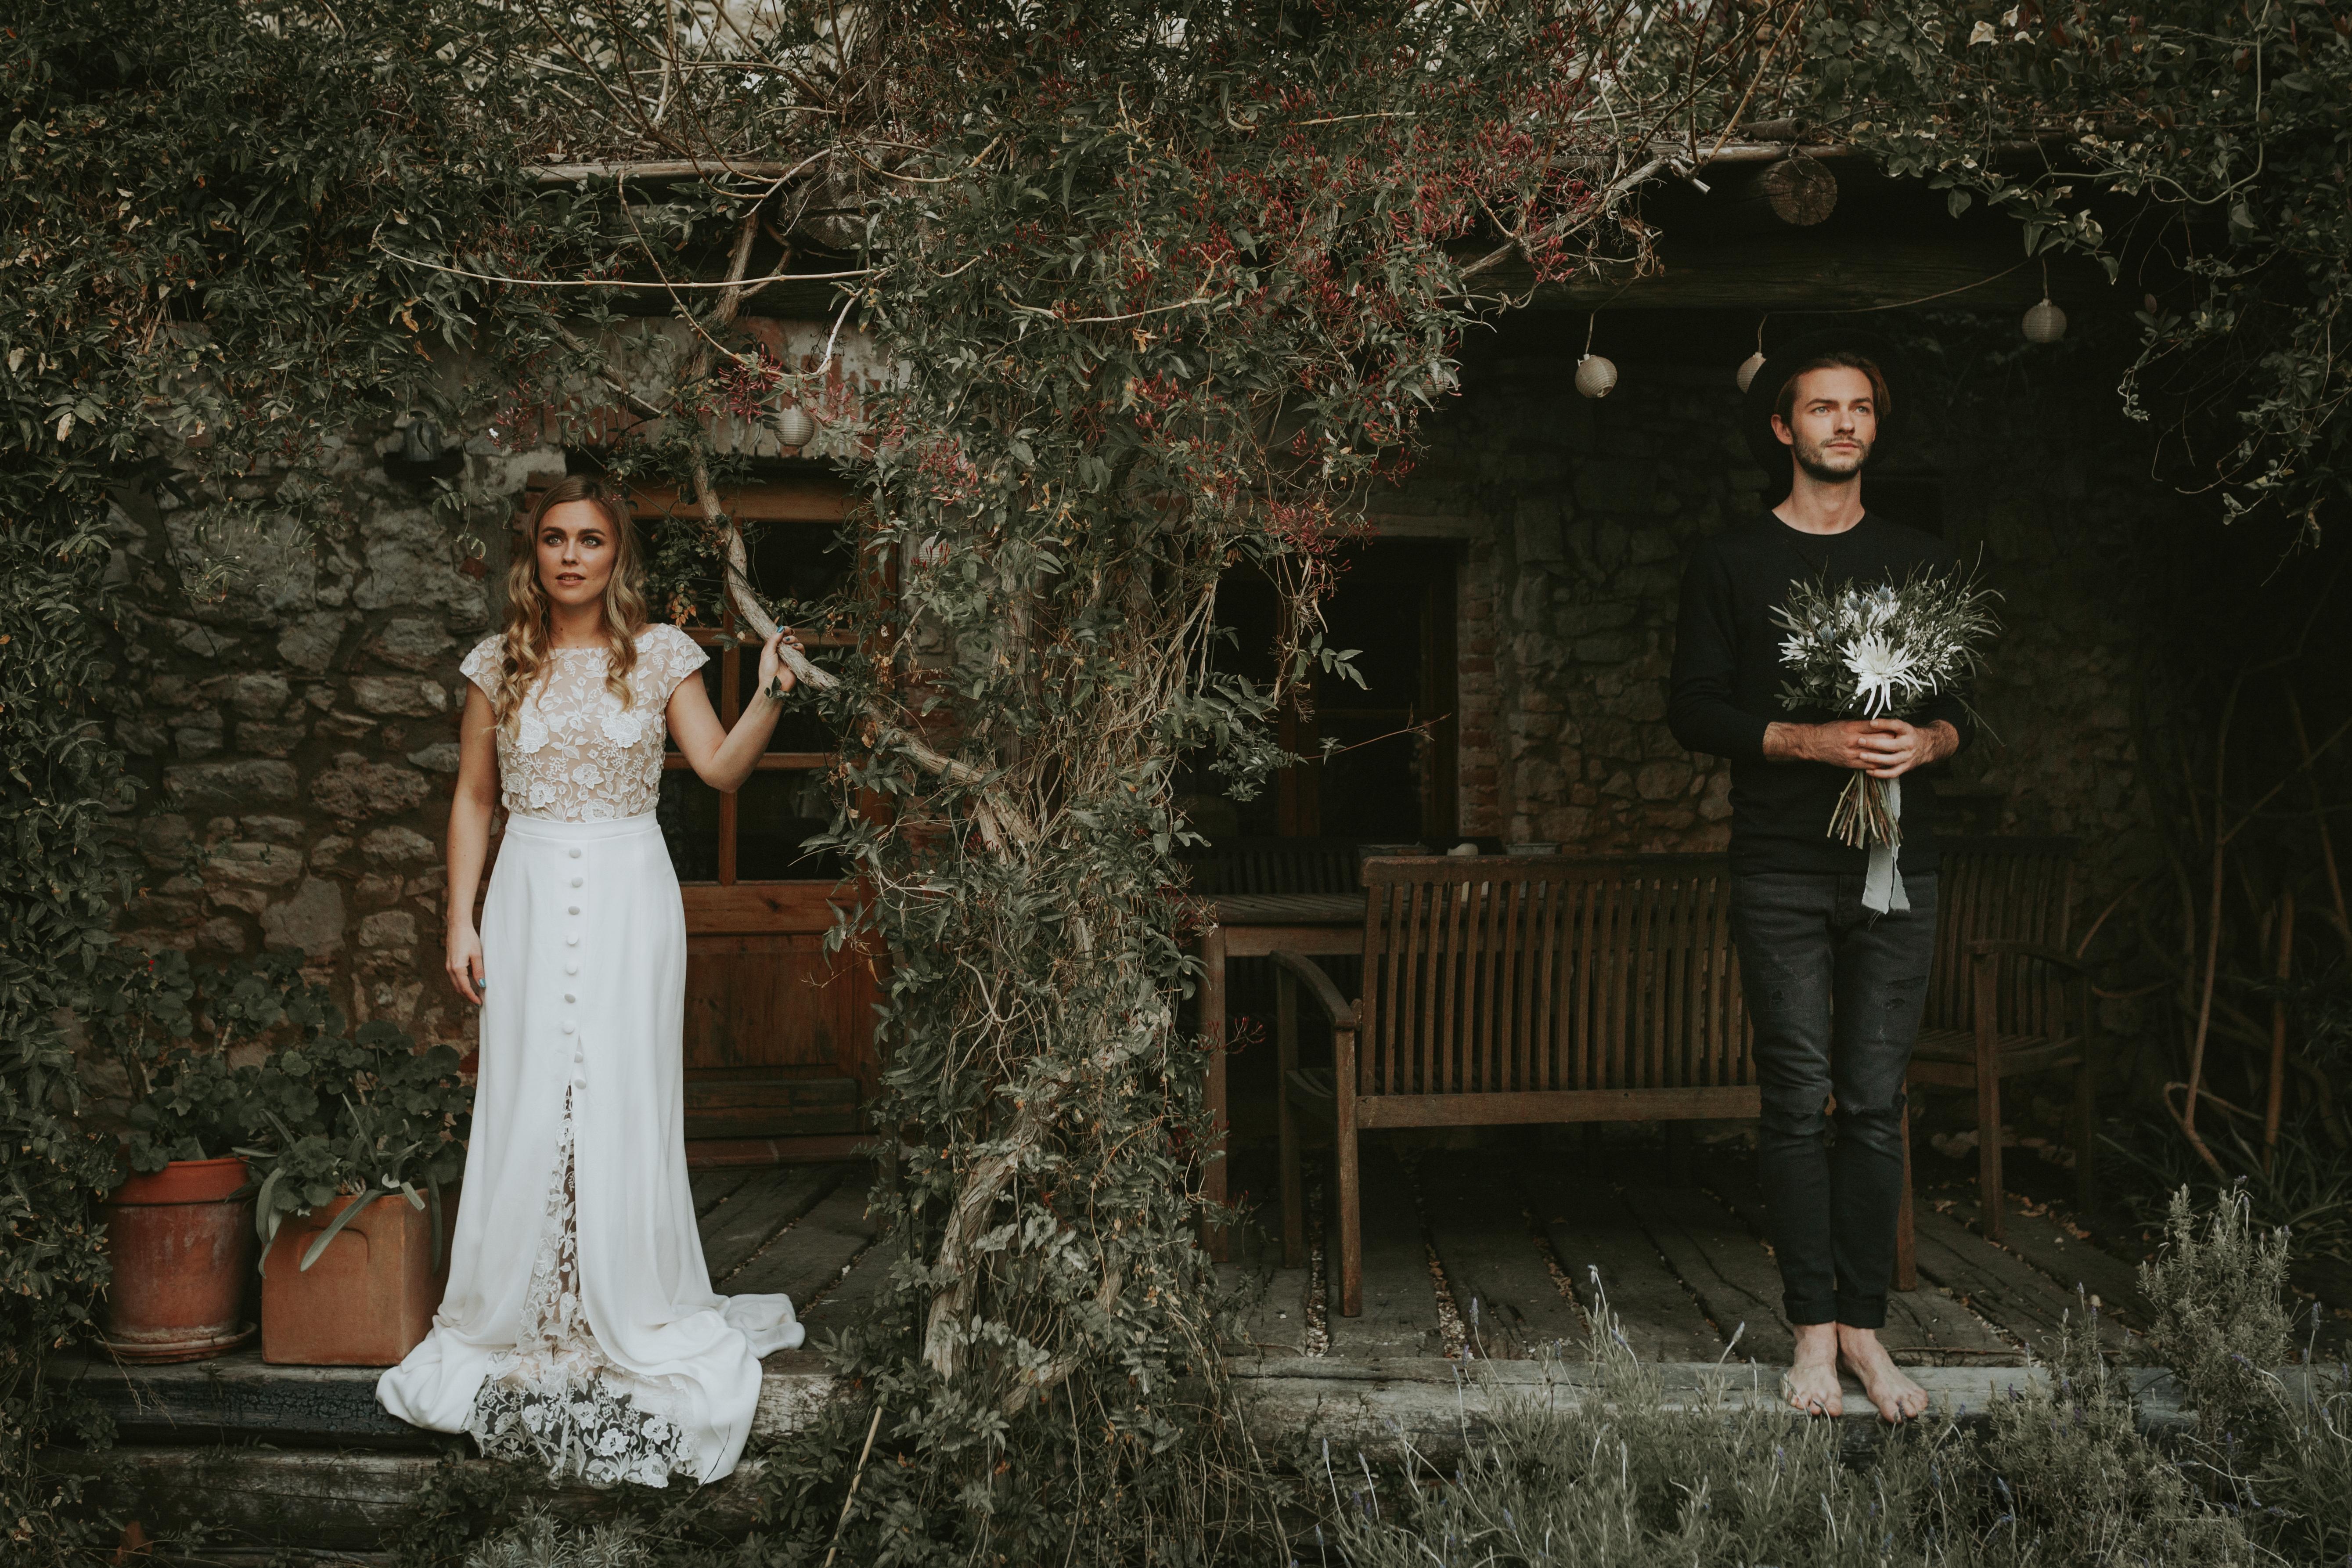 Mediterranean Wedding in a XVI Century Masia Destination Wedding Planner The Creatives Loft Wedding Studio and Vasver Photographers